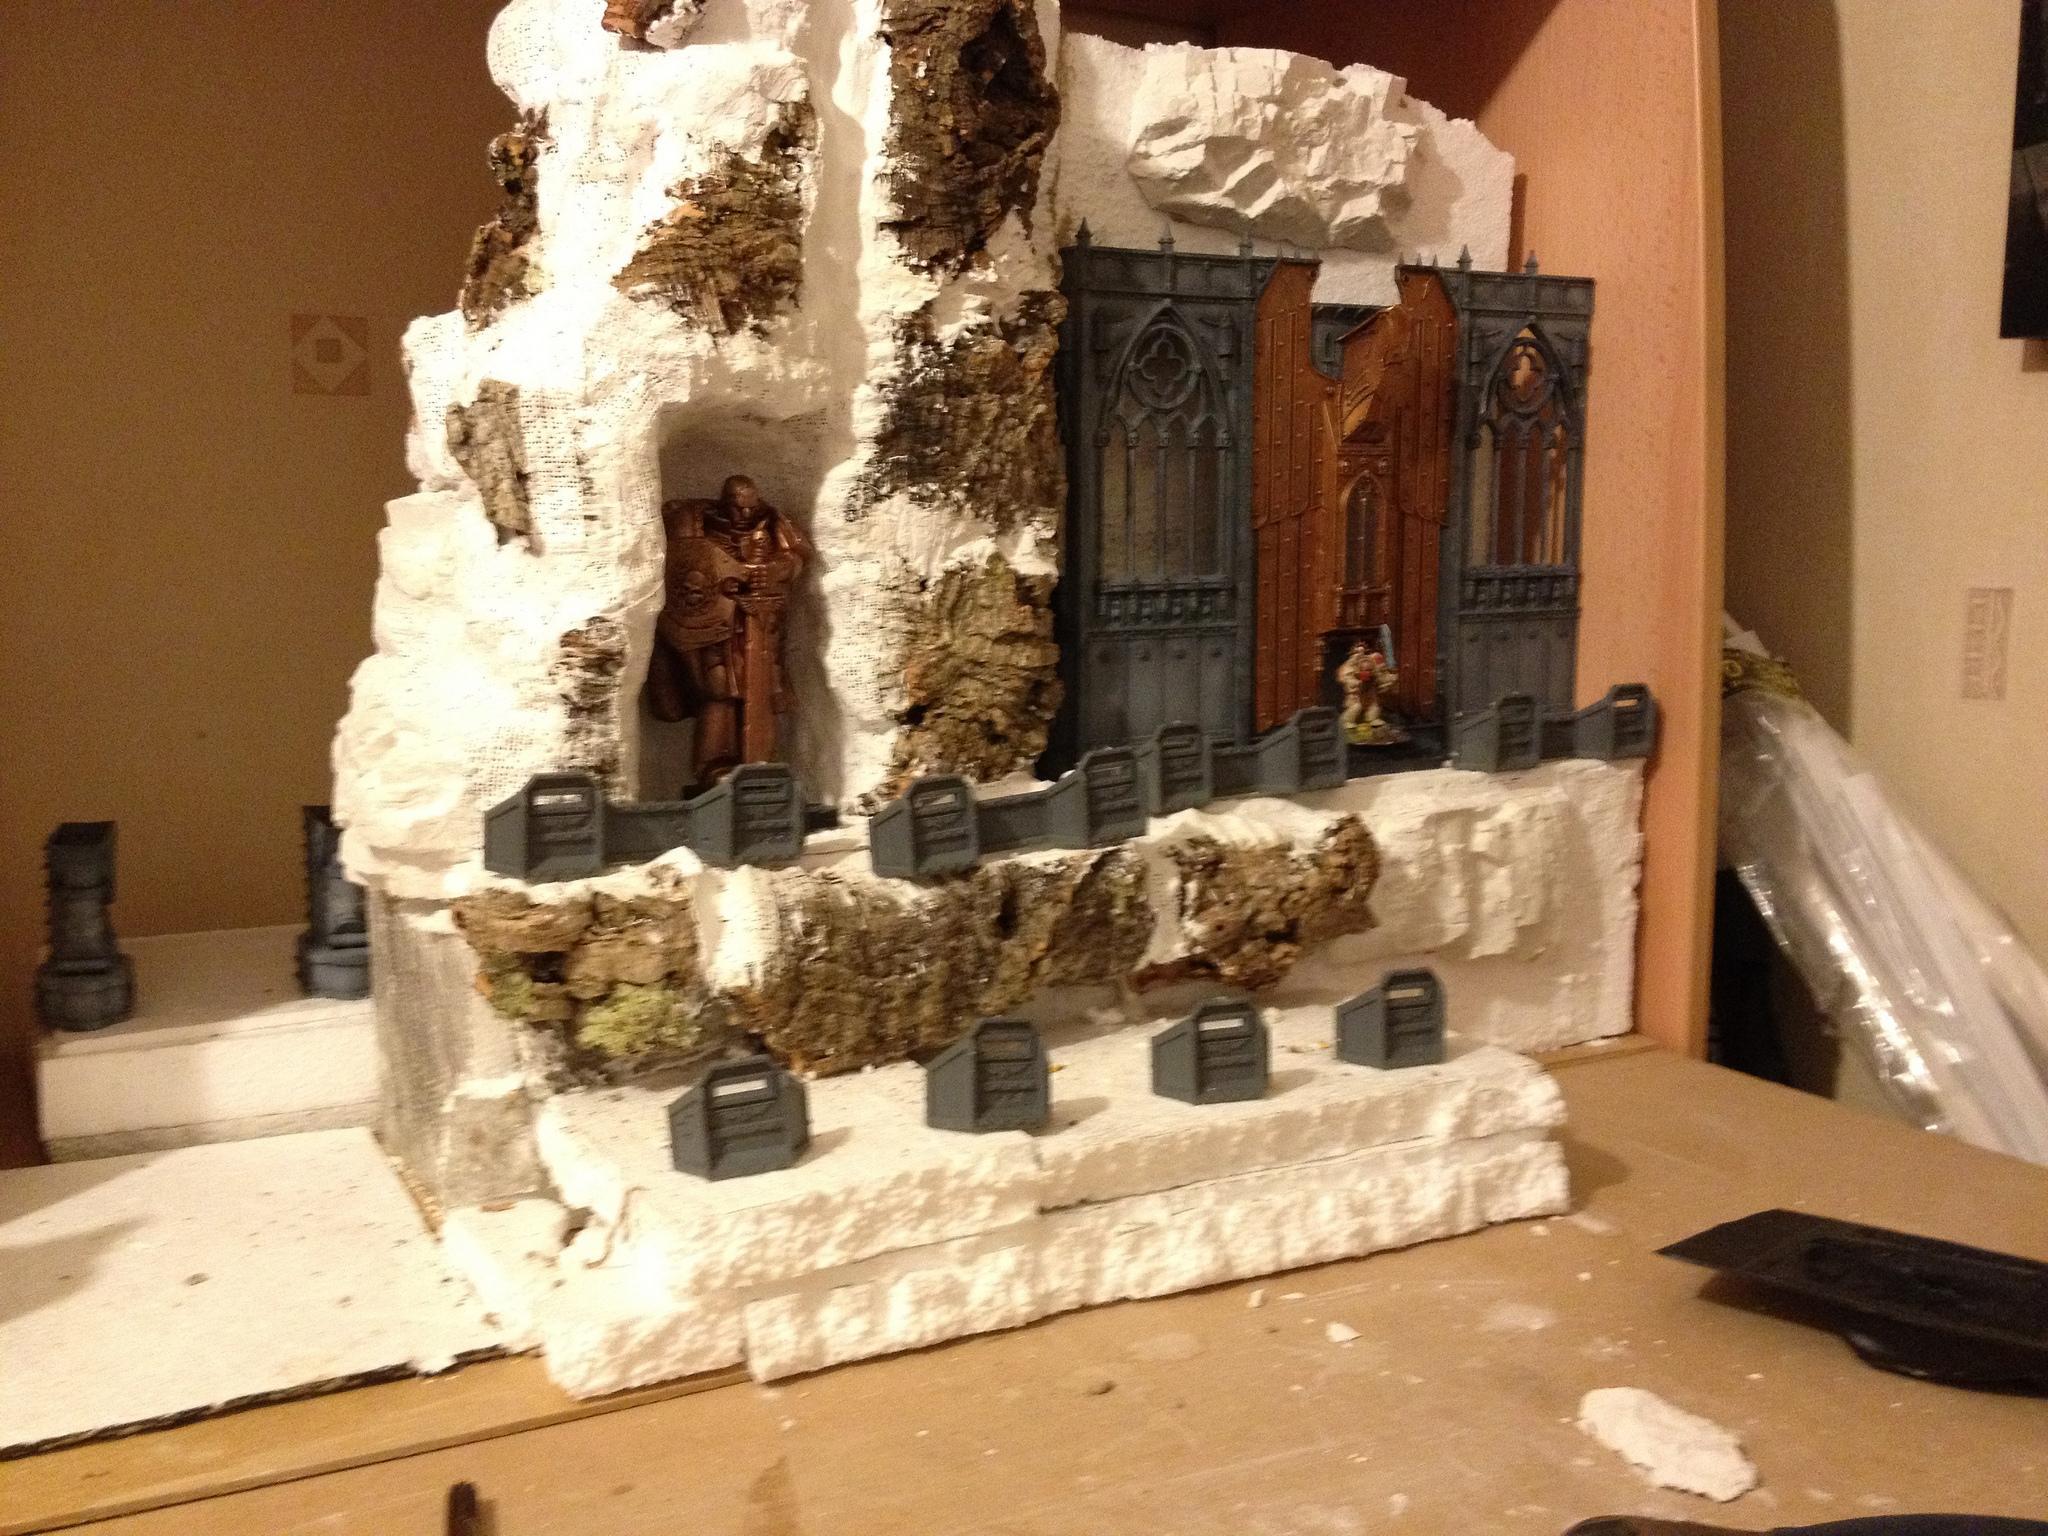 Display Board, Imperial, Shrine Of Aquila, Skyshield, Terrain, Warhammer 40,000, Work In Progress